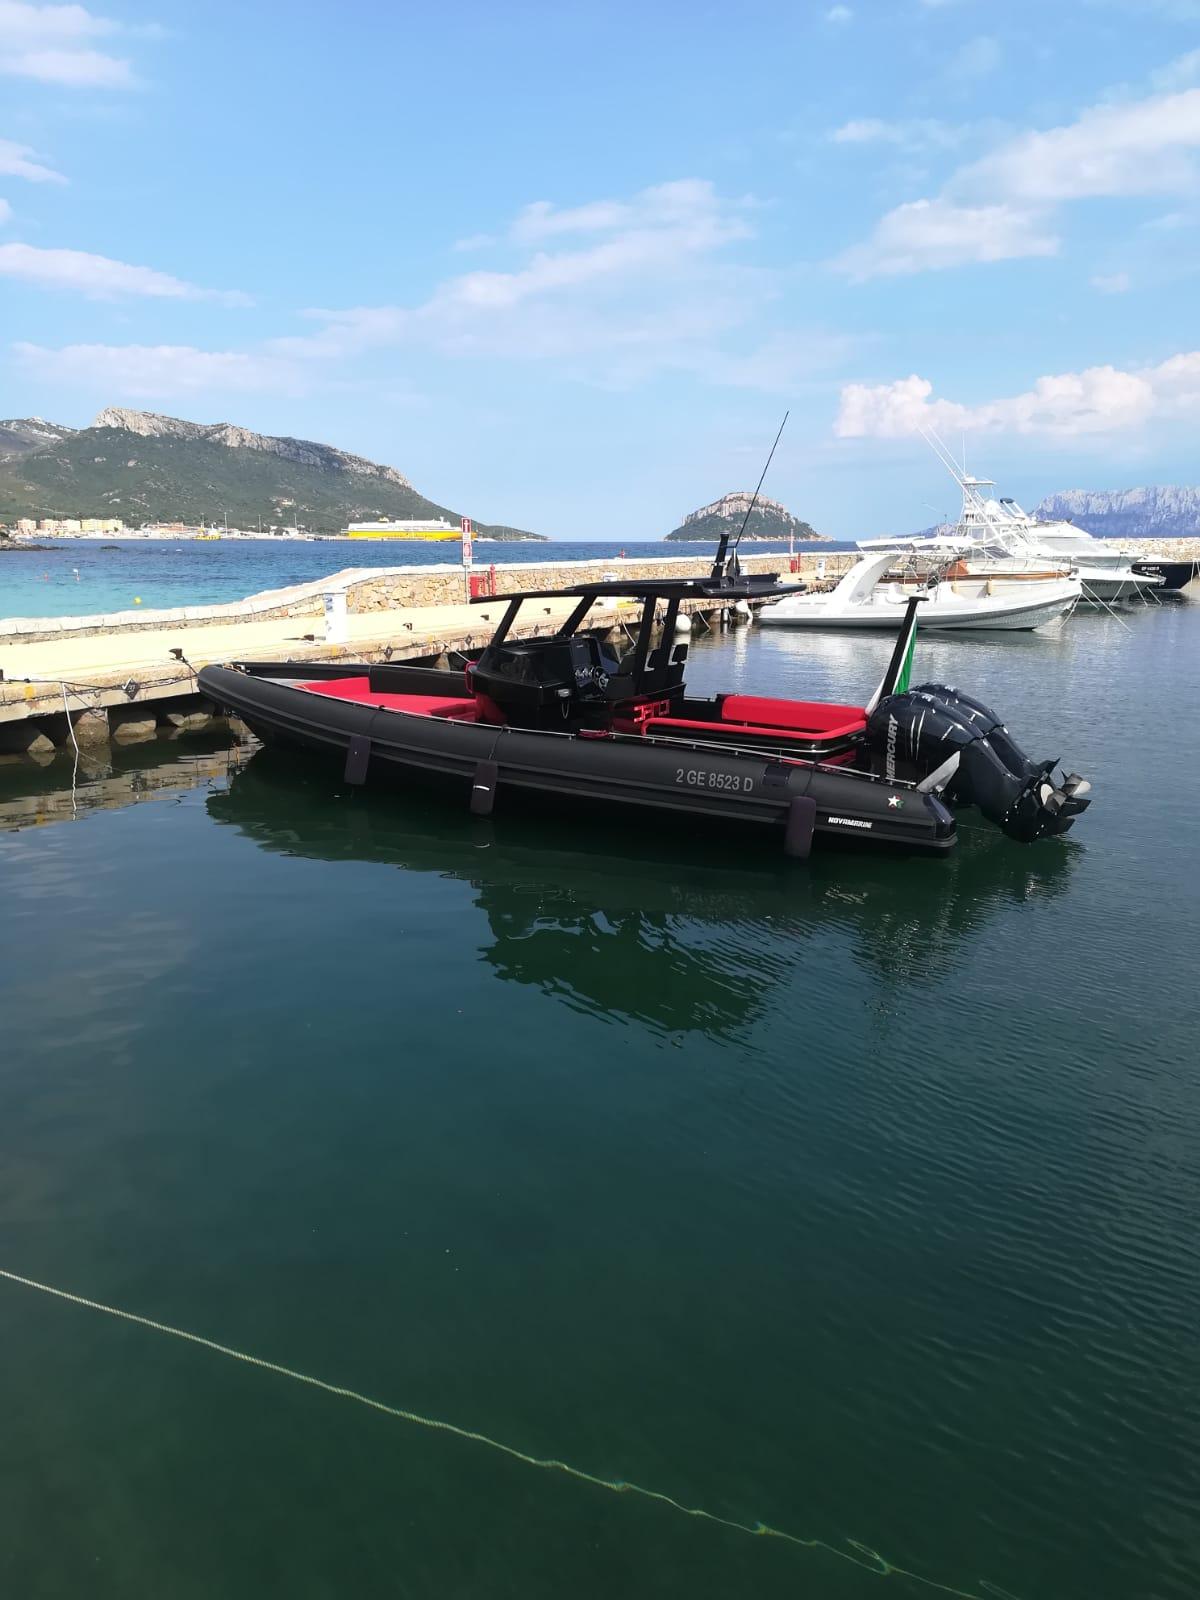 Luxury yacht for Sale | Black Shiver 100 (2014) by Novamarine